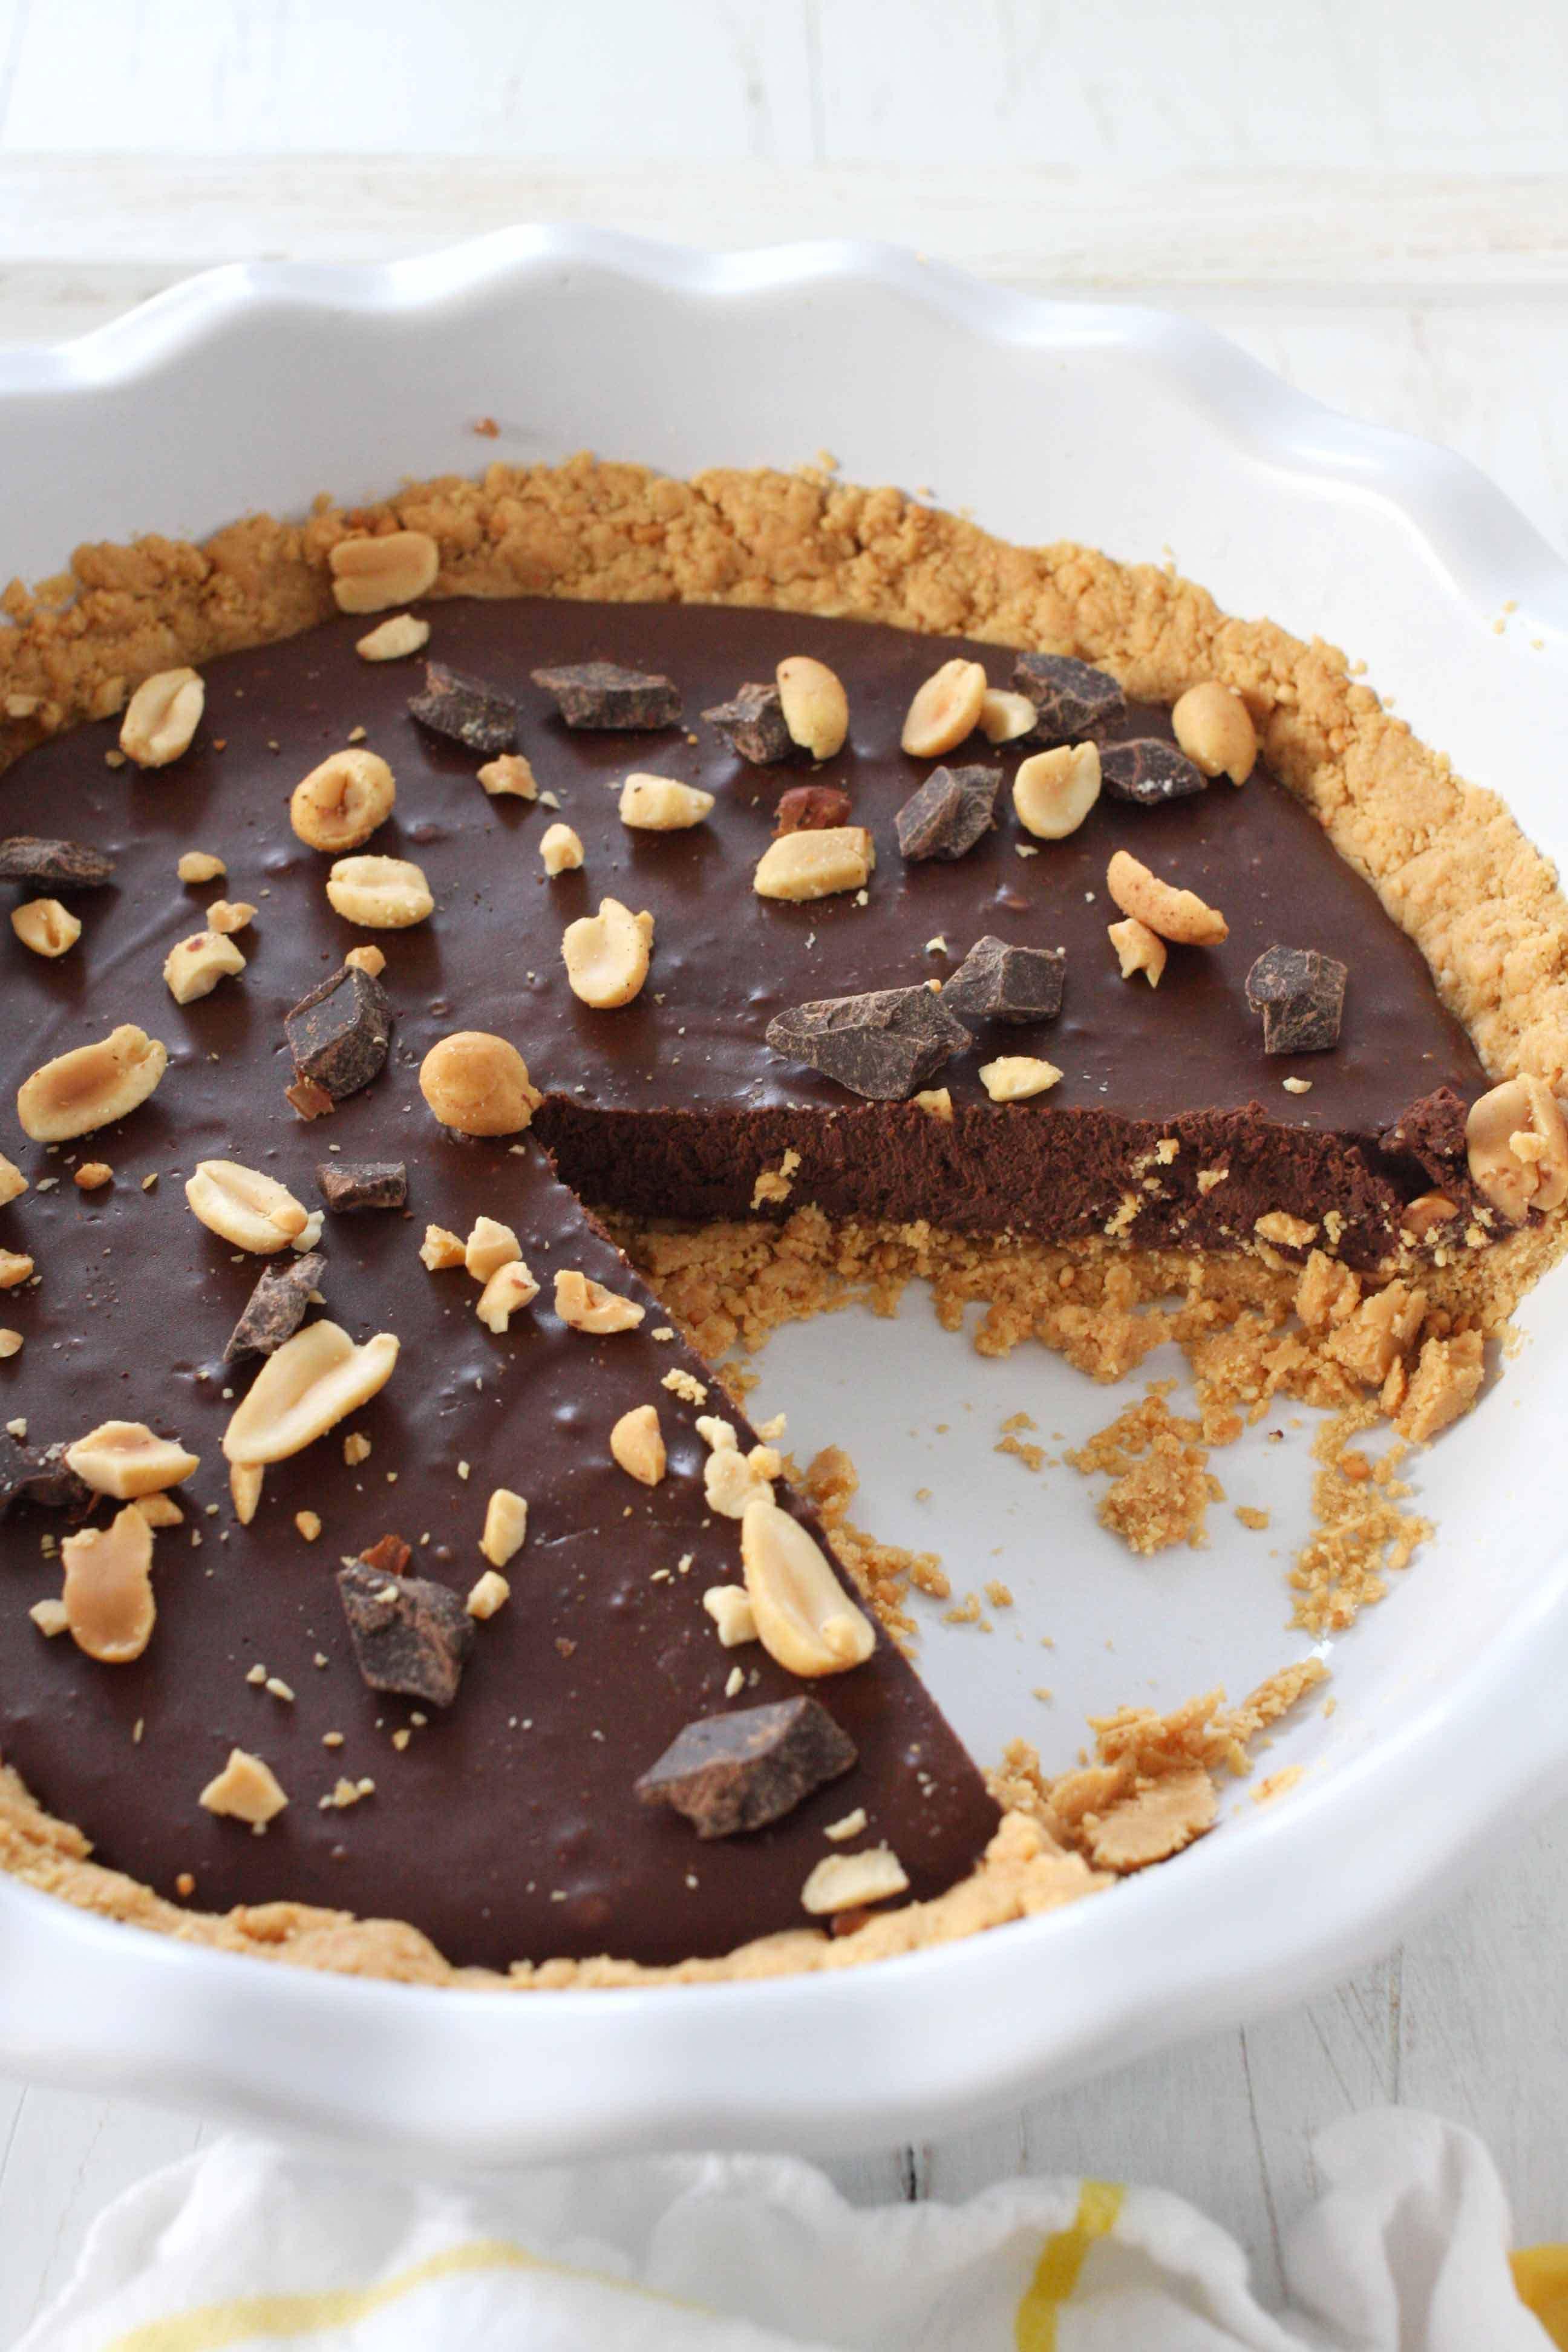 No Bake Chocolate Peanut Butter Pie